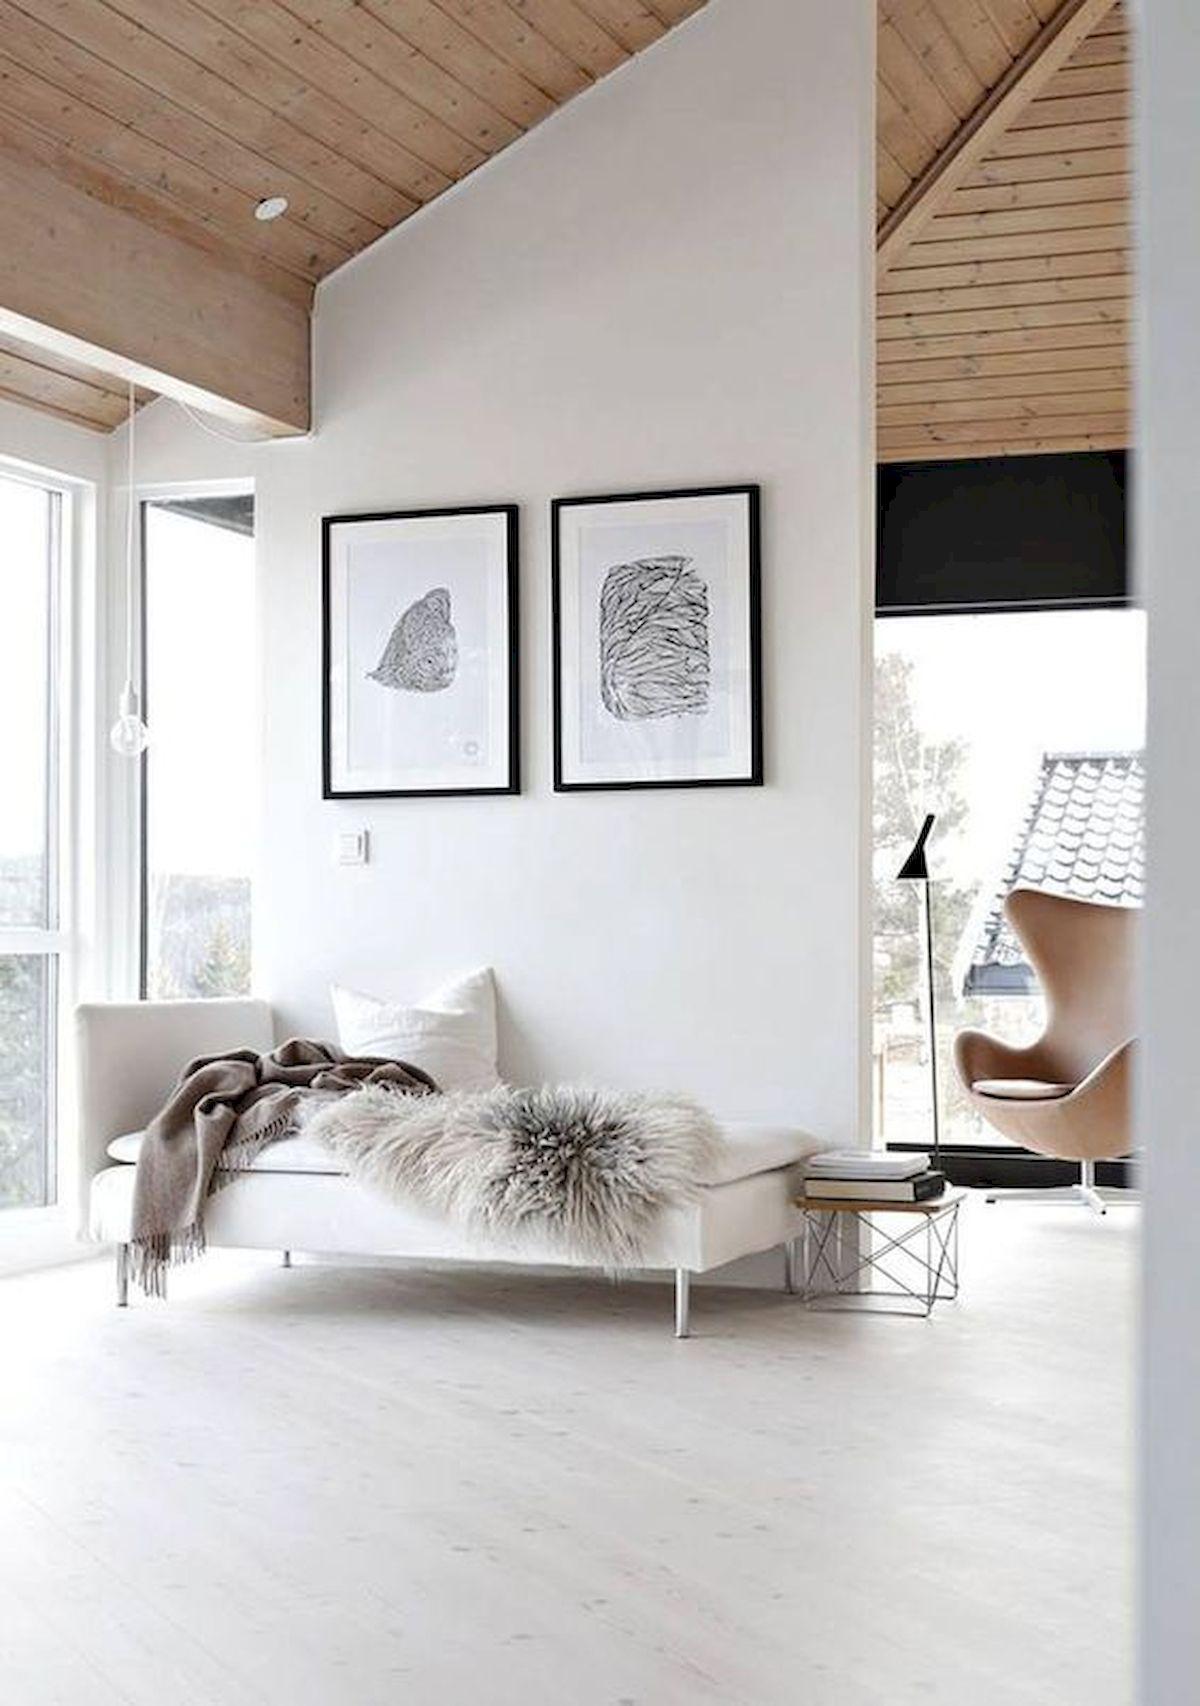 35 Stunning Scandinavian Interior Design and Decor Ideas (19)